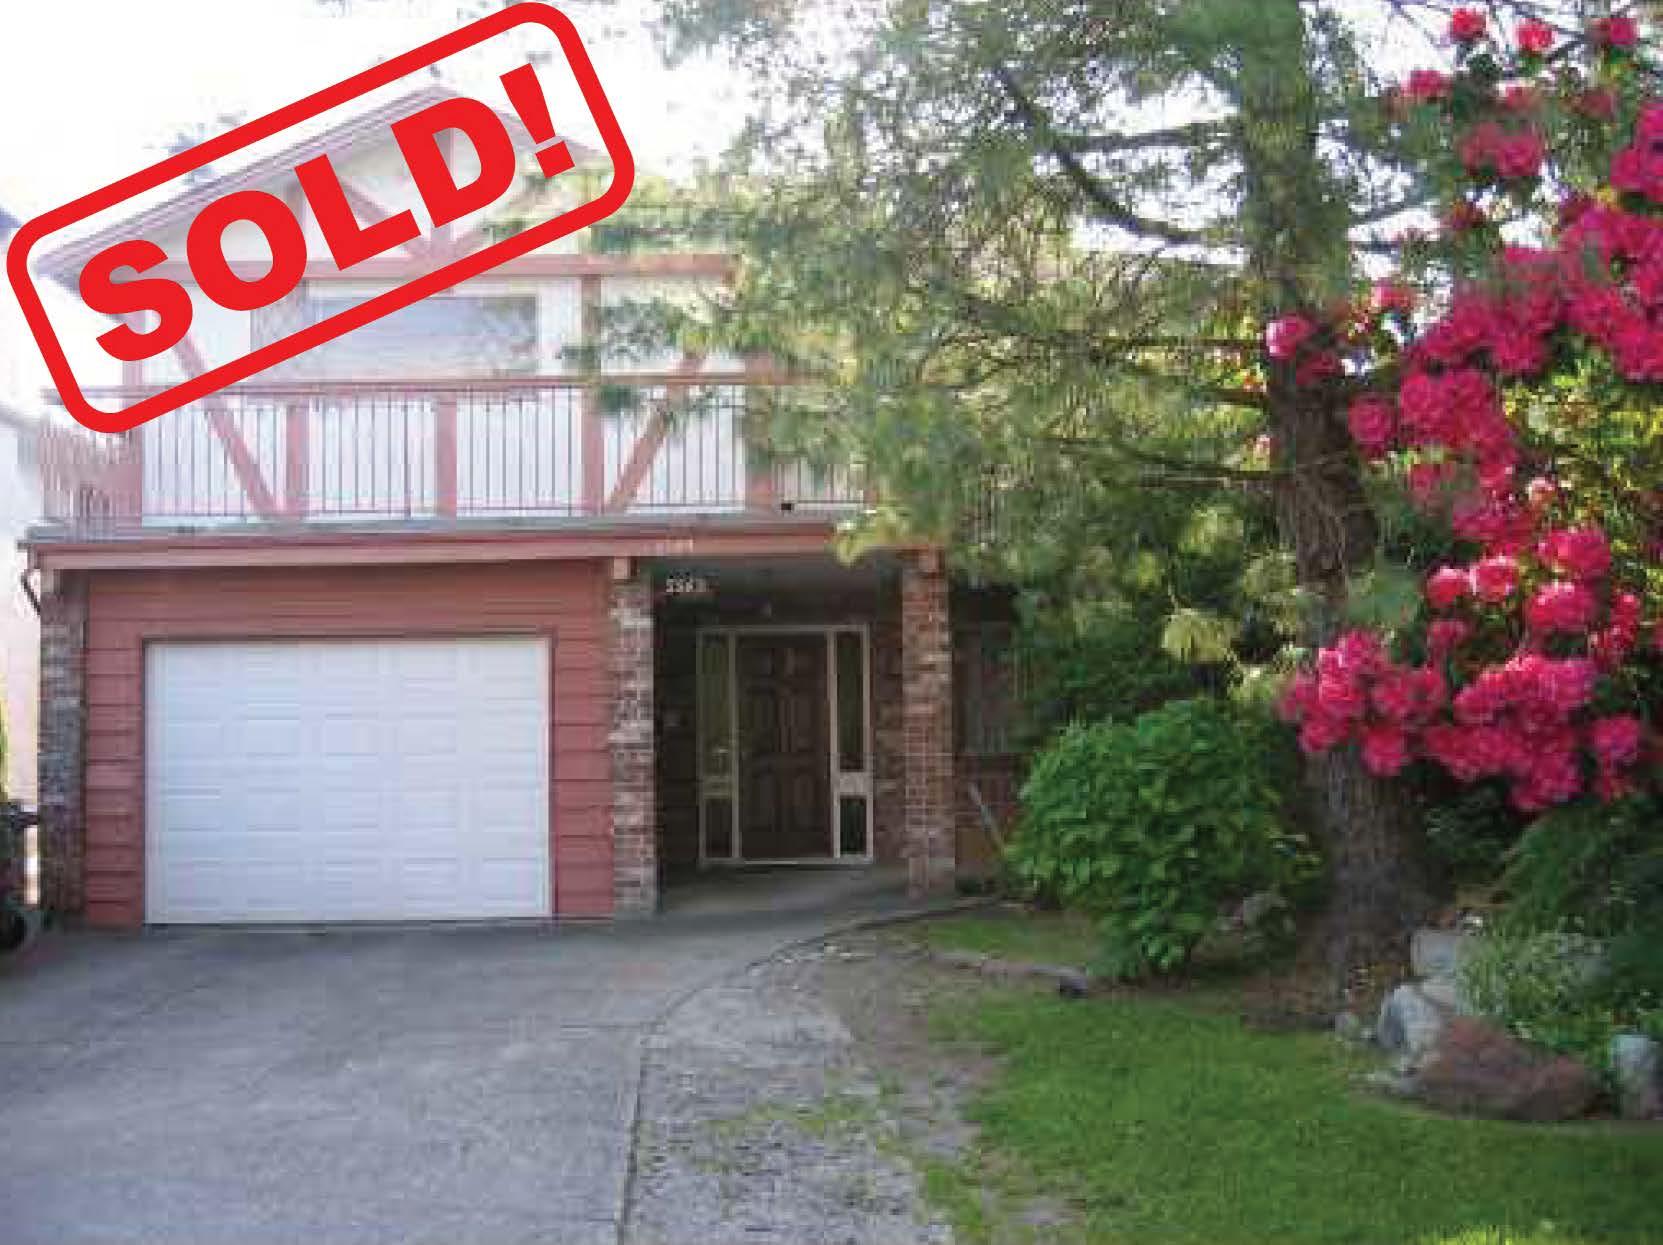 5549 Mackenzie Street   Sold foR: $2,849,059  4 Bed | 4 Bath | 2,820 SF